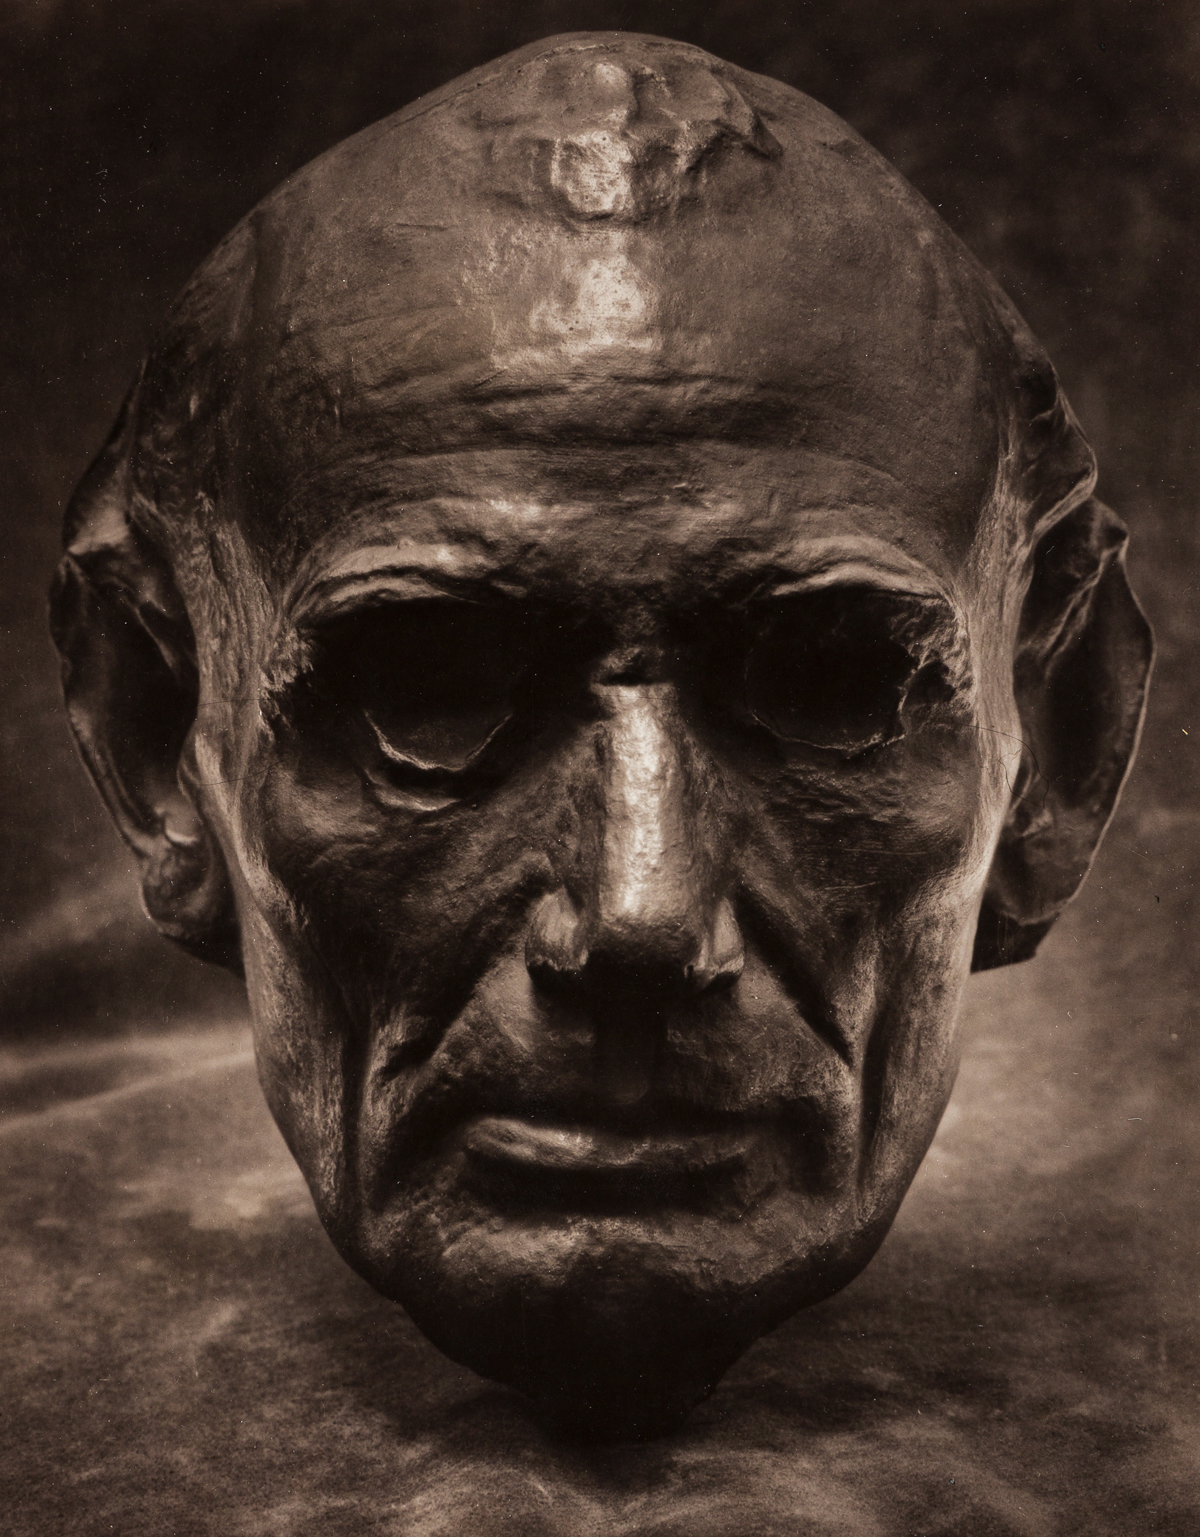 EDWARD STEICHEN (1879-1973) Life Mask of Abraham Lincoln.